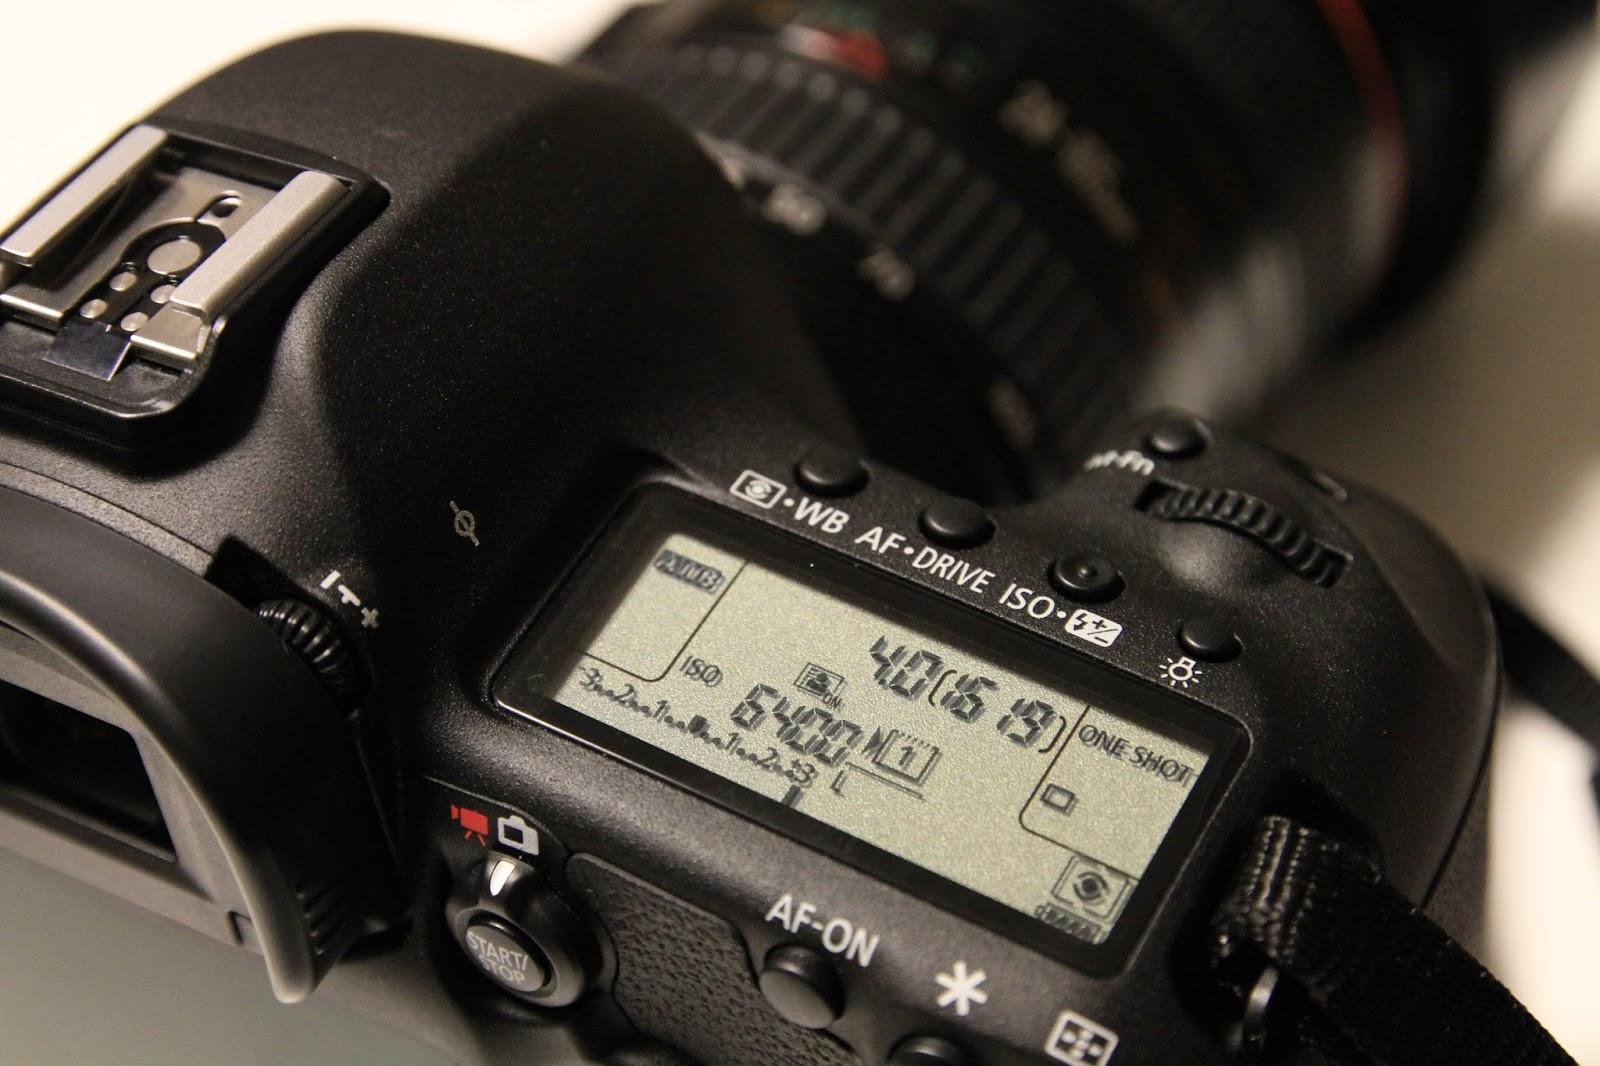 Daftar Harga Kamera Terbaru Agustus 2016 Perbandingan Nikon D3300 Kit 18 55mm Vr Hitam Canon Eos 5d Mark Iii Lensa 24 105mm 223 Mp